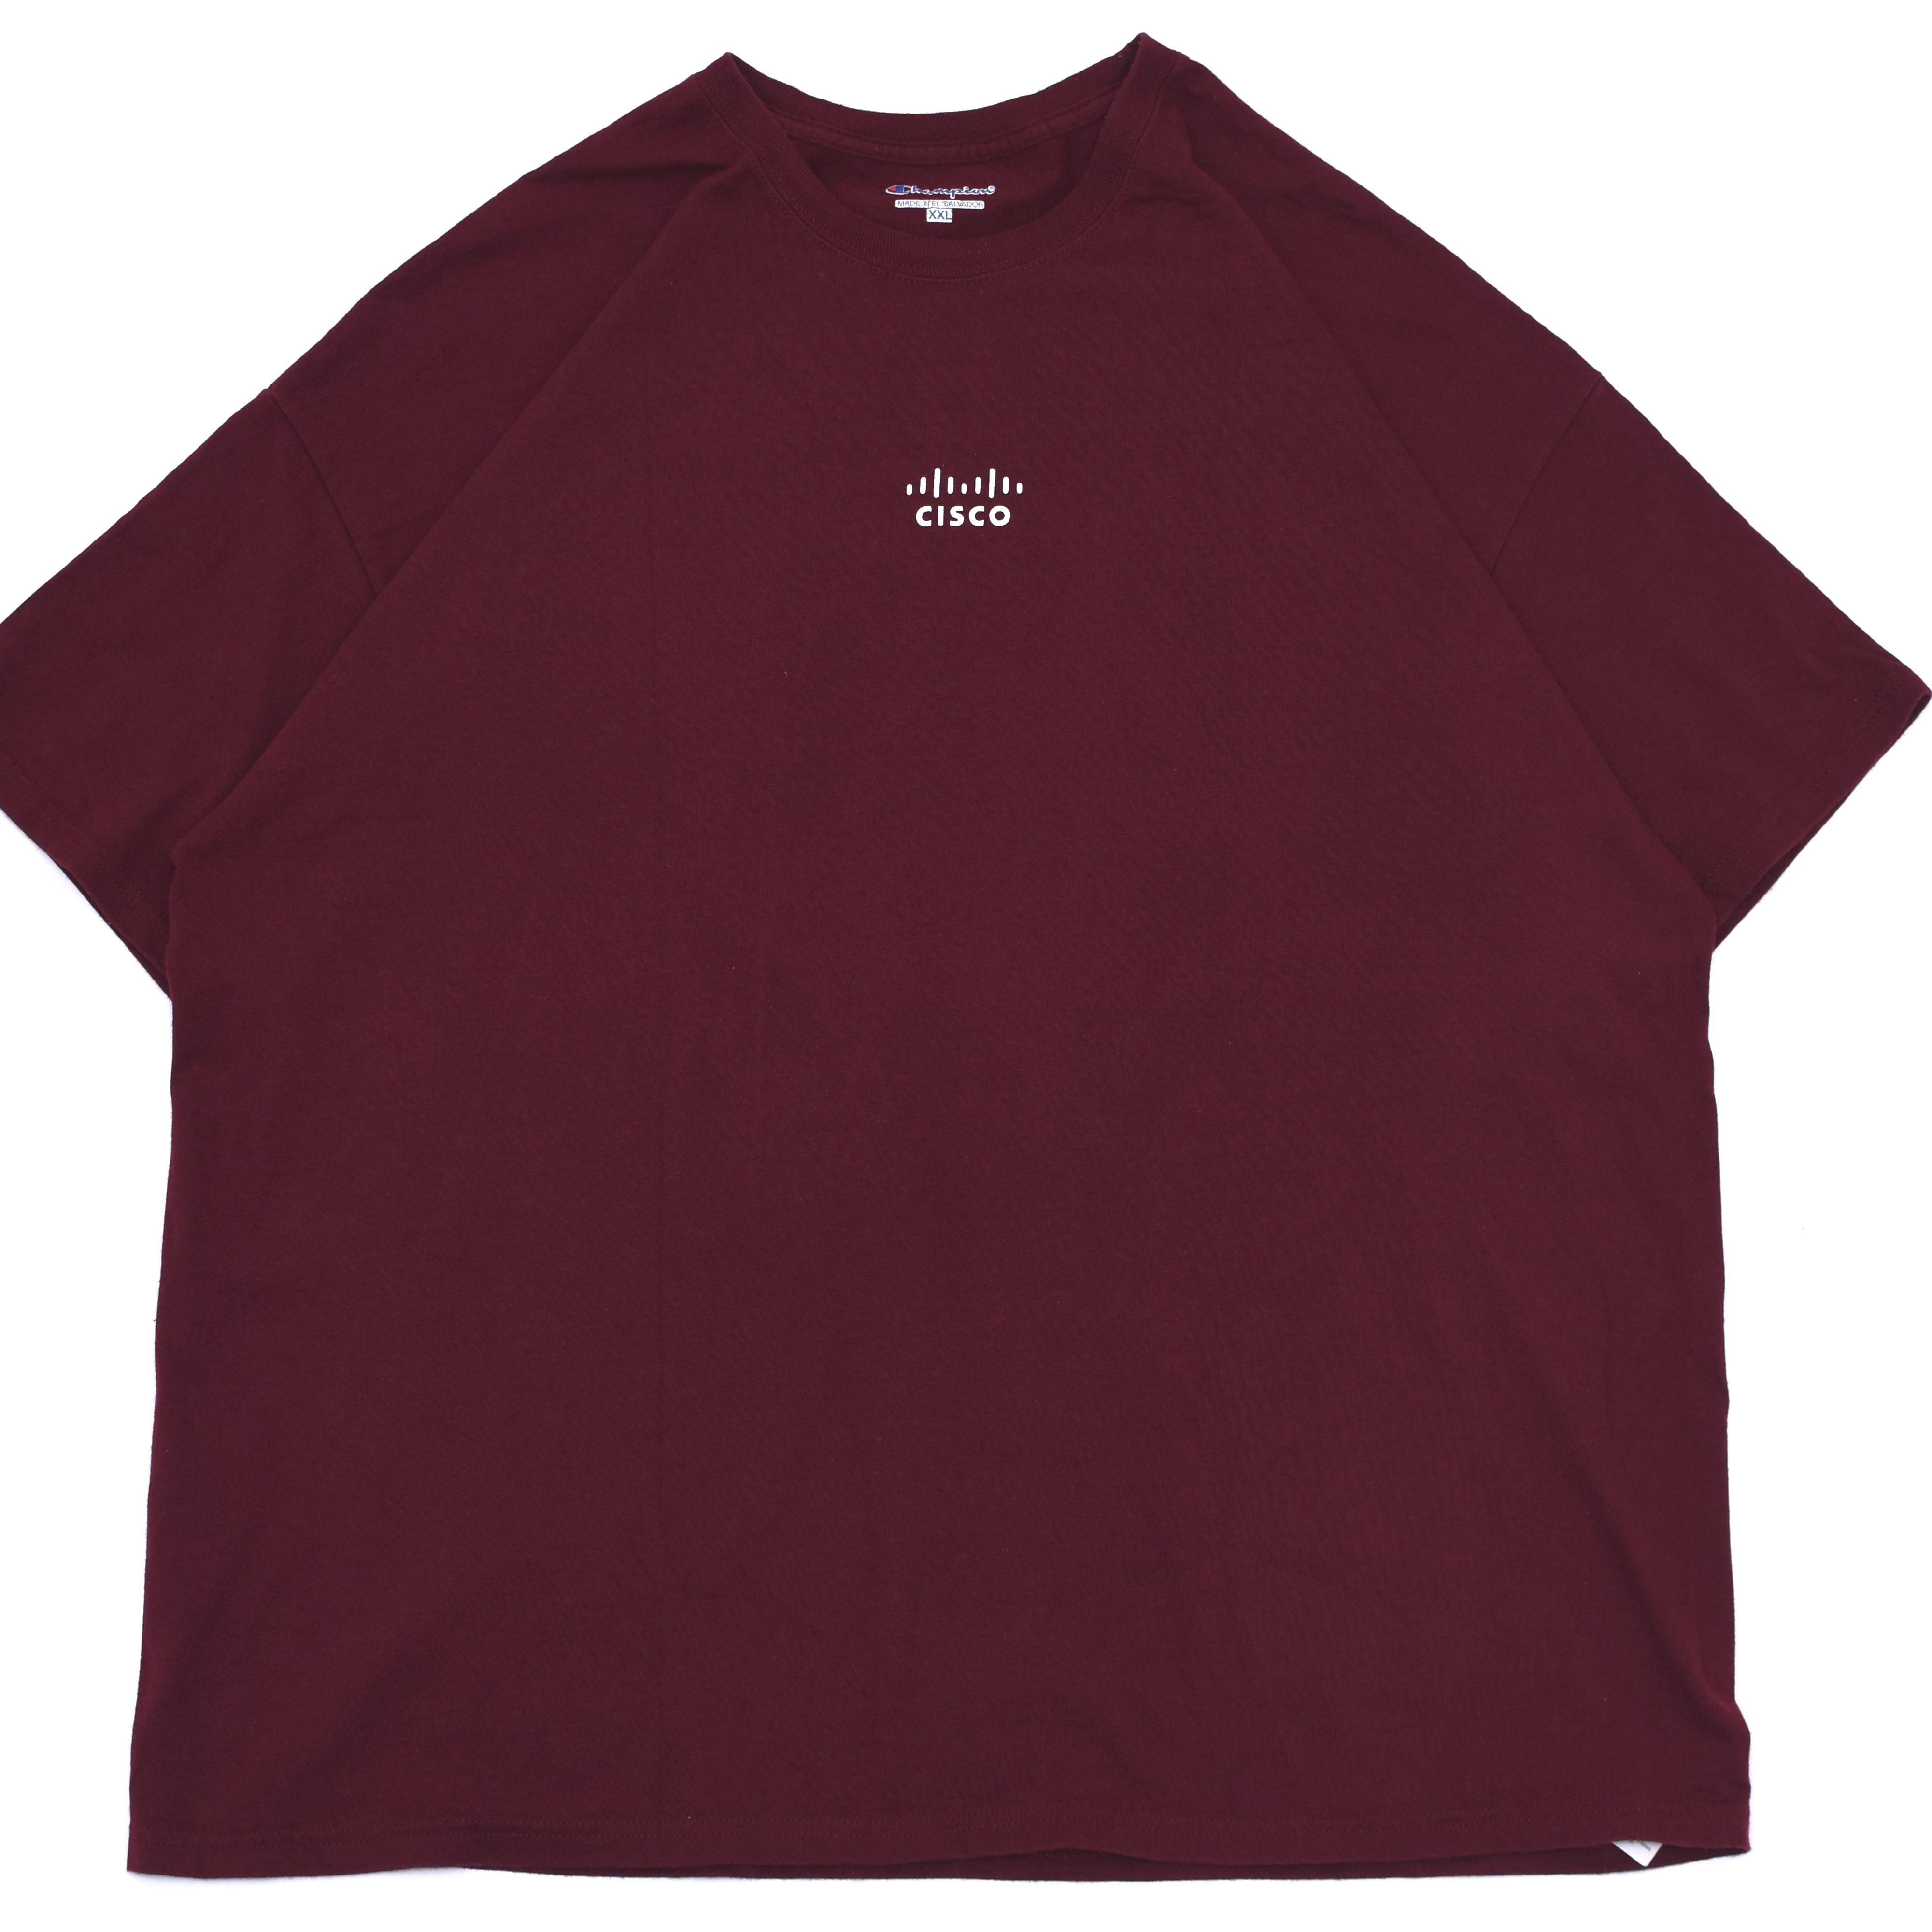 00's champion preshrunk cotton T shirt